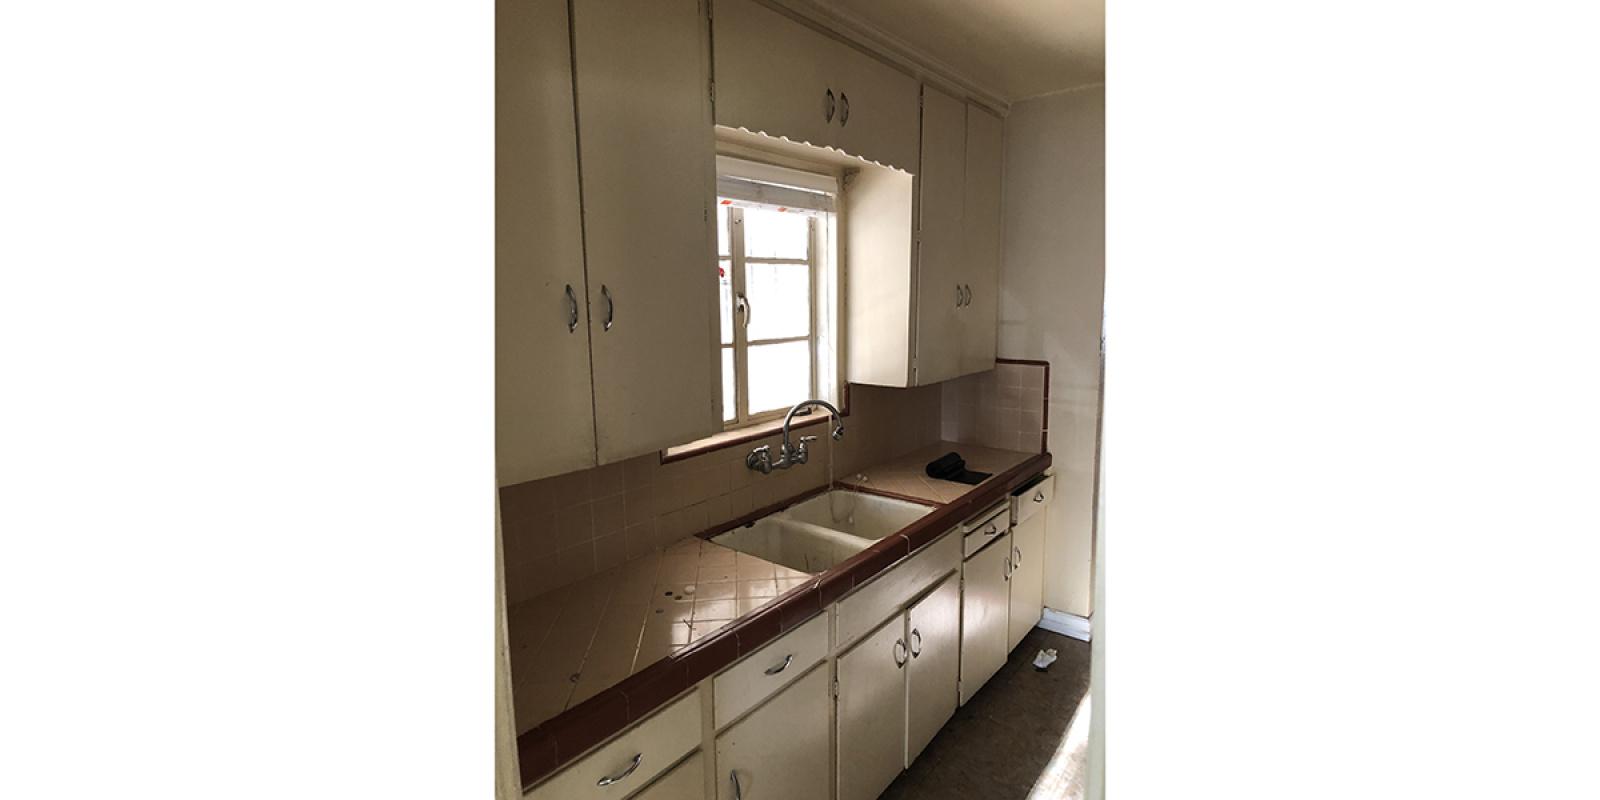 3307 N 17th Dr, Phoenix, Arizona 85015, 3 Bedrooms Bedrooms, ,2 BathroomsBathrooms,SFR,Sold,N 17th Dr,1268